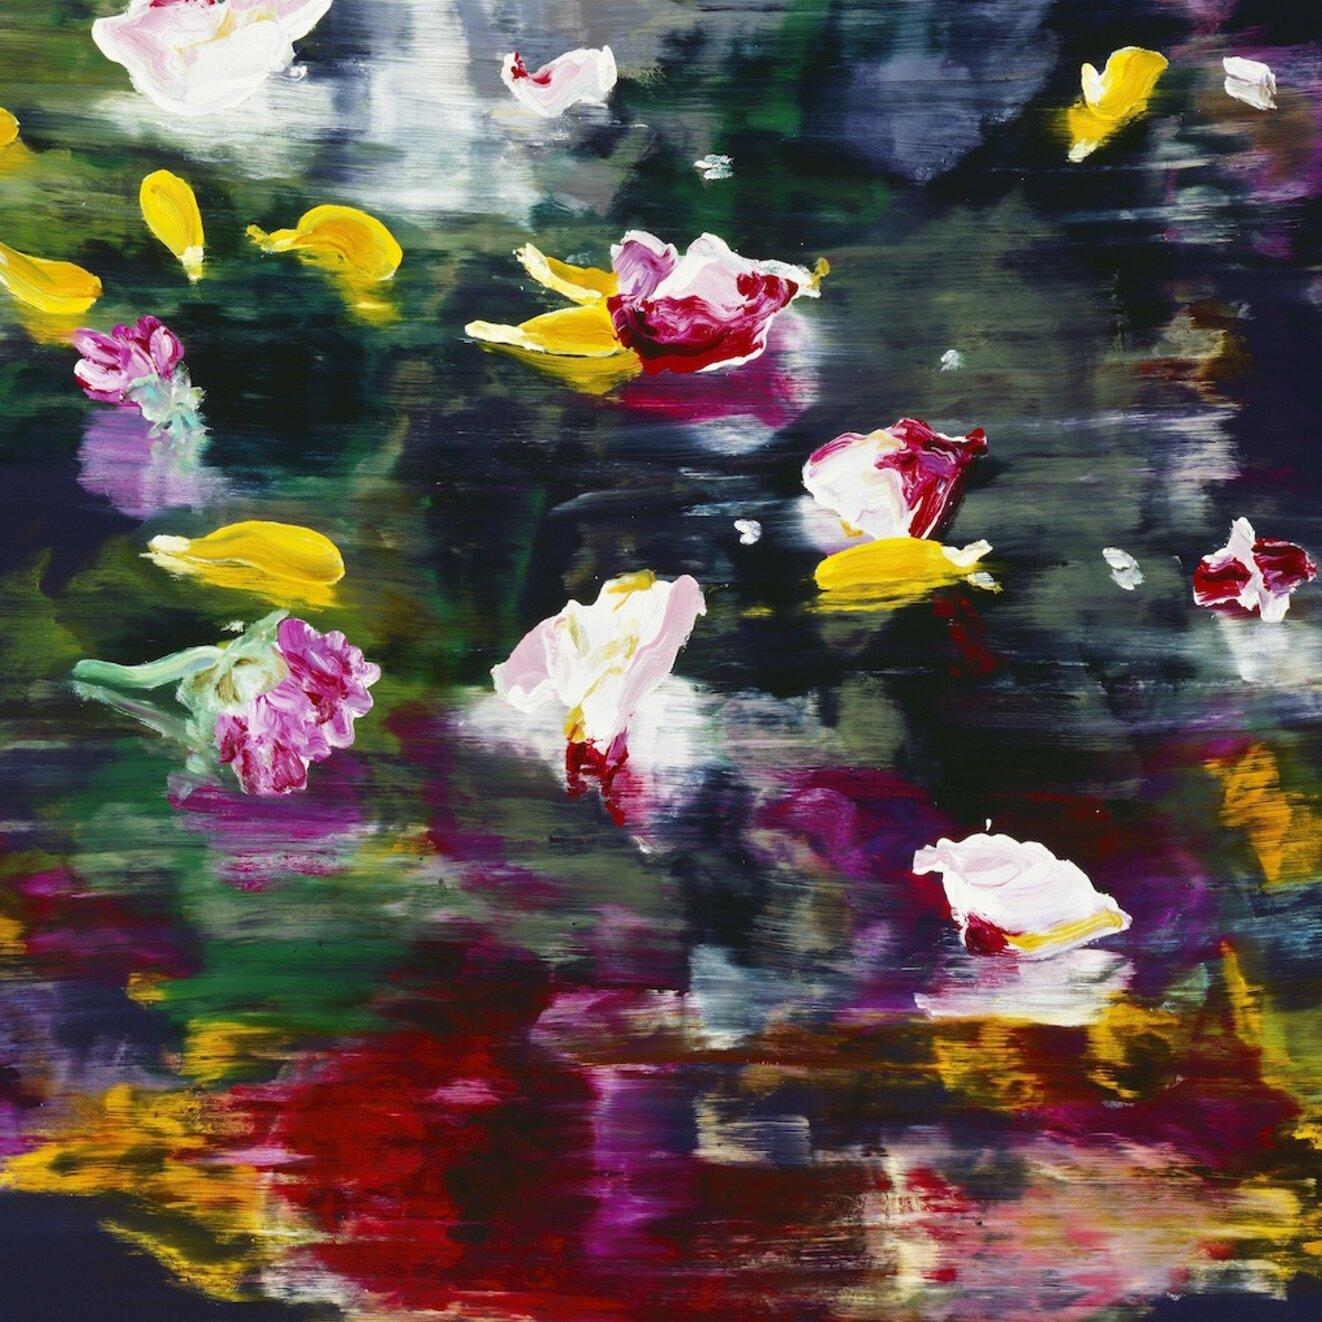 Cornelius Völker / Asche - Wolken - Blüten